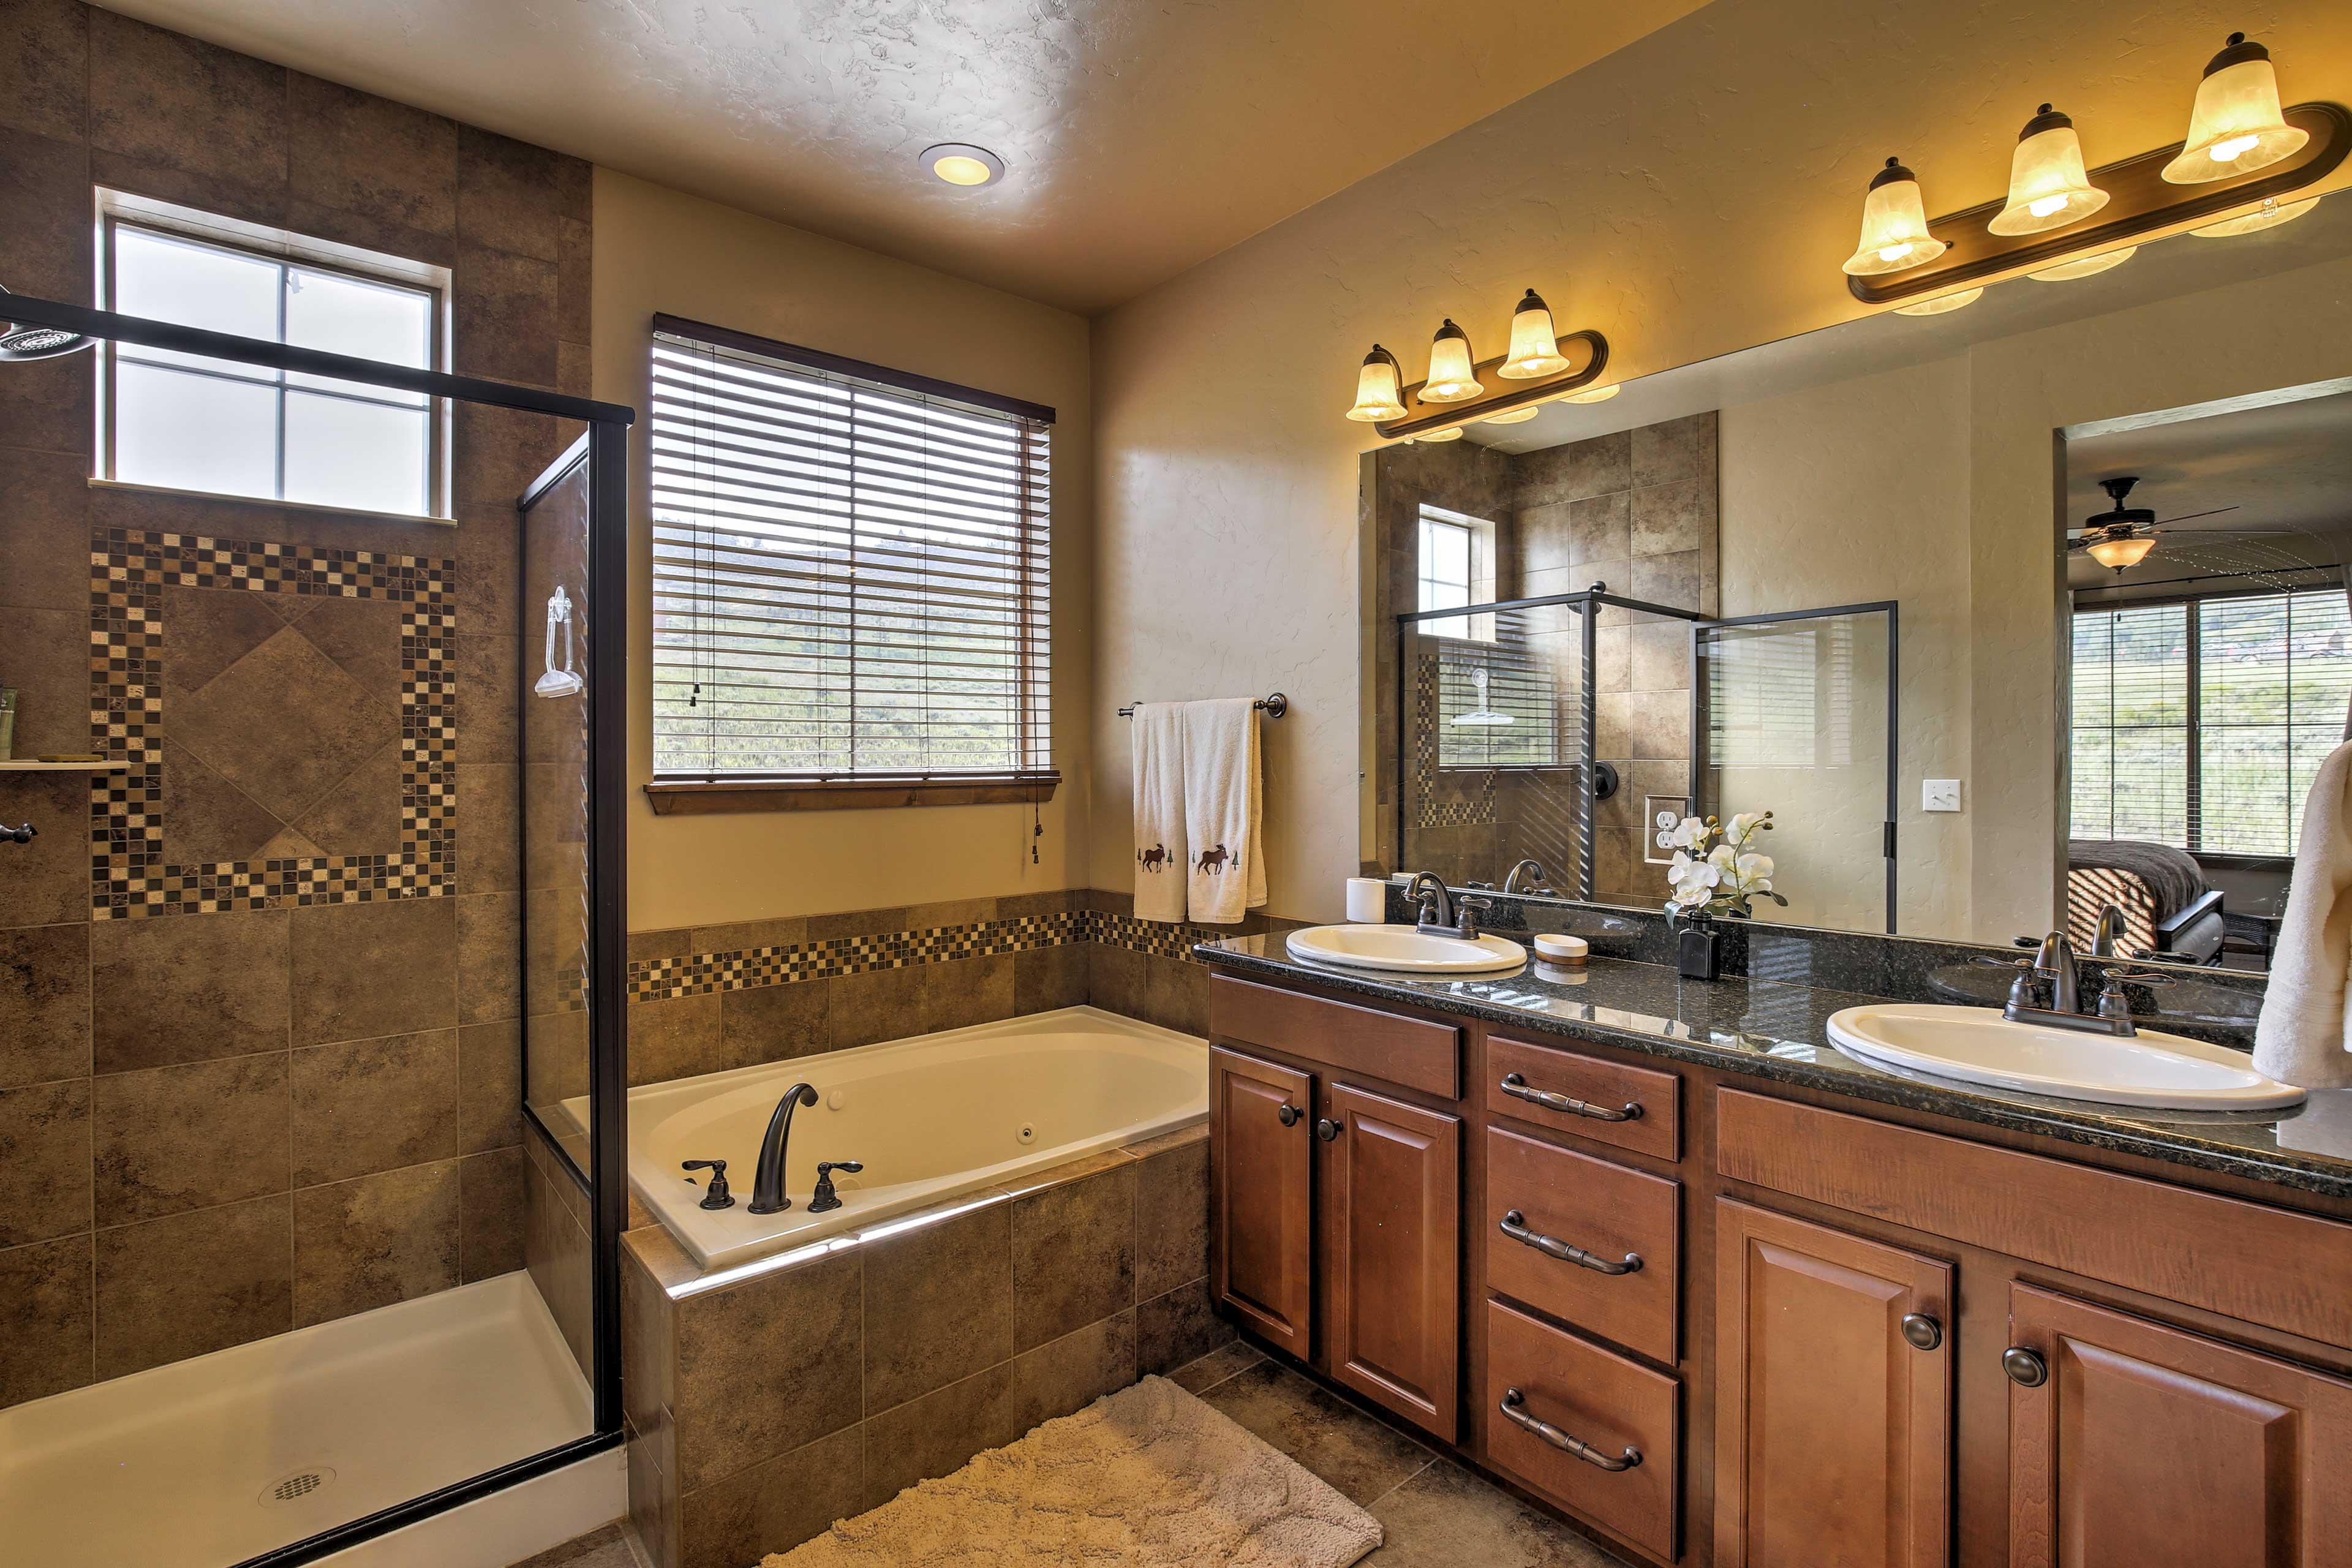 Take a bubble bath in the master suite.